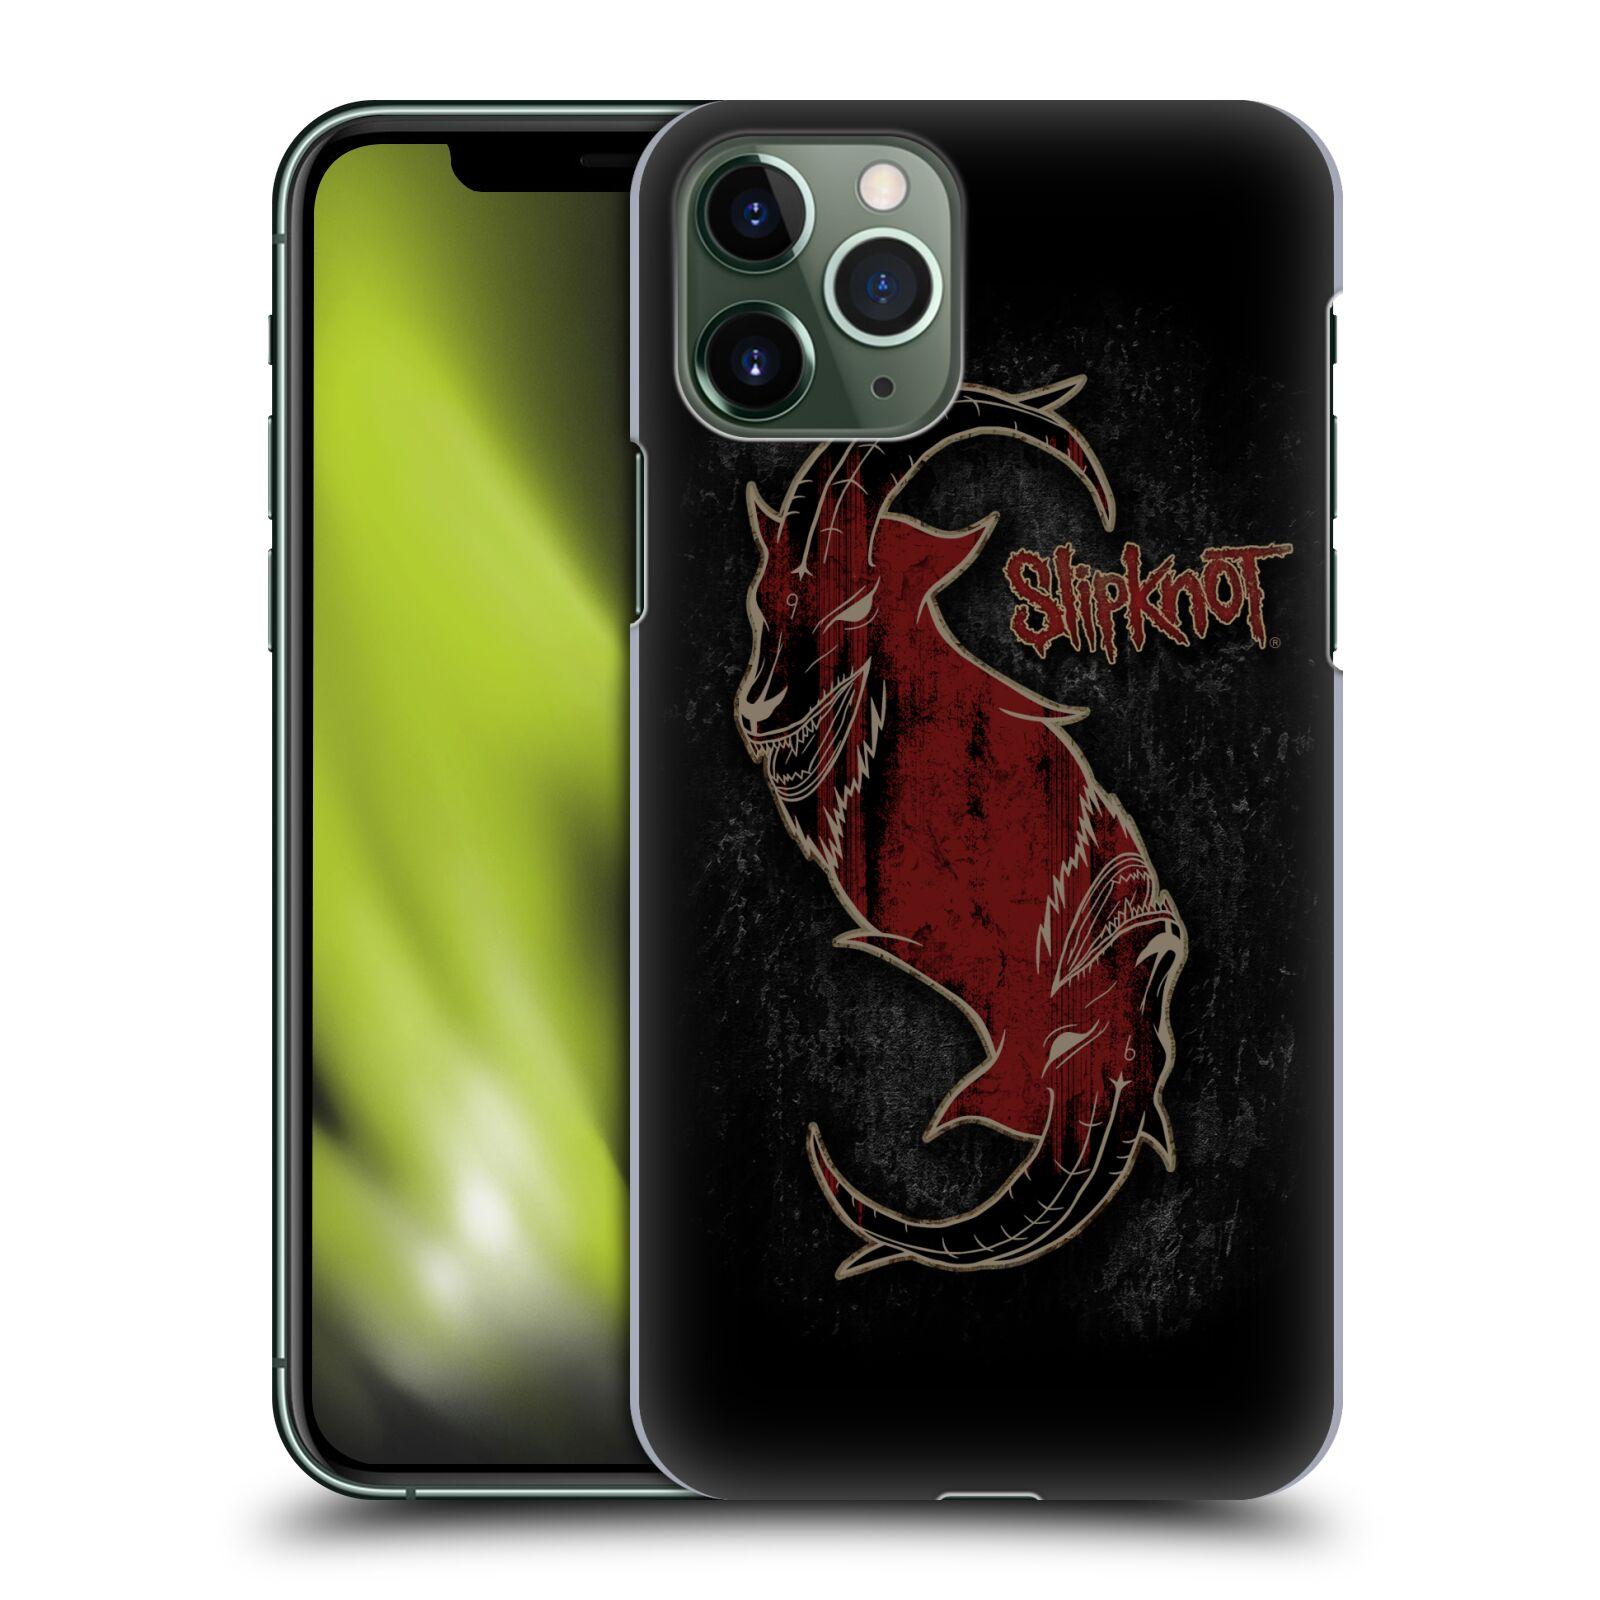 Plastové pouzdro na mobil Apple iPhone 11 Pro - Head Case - Slipknot - Rudý kozel